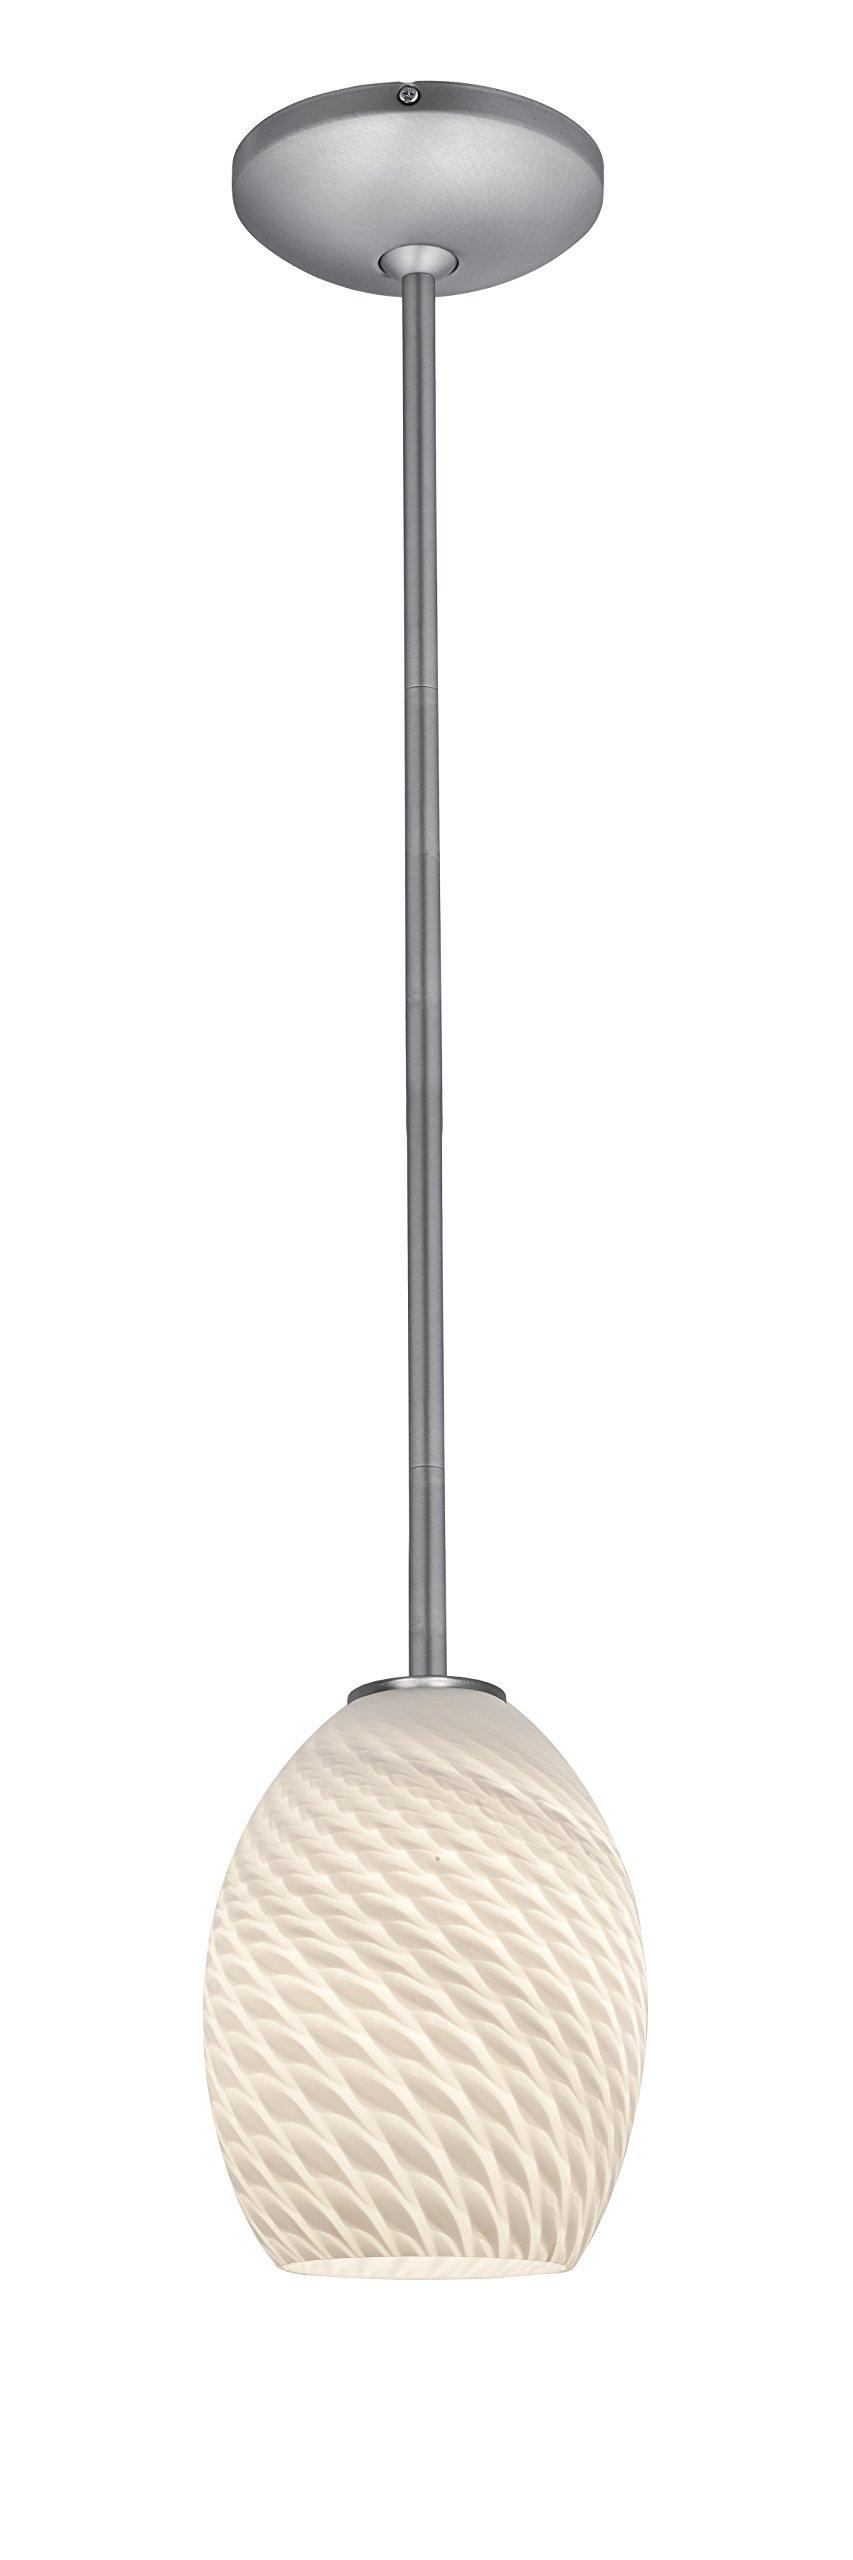 Brandy FireBird Glass Pendant - 1-Light Pendant - Rods - Brushed Steel Finish - White Firebird Glass Shade